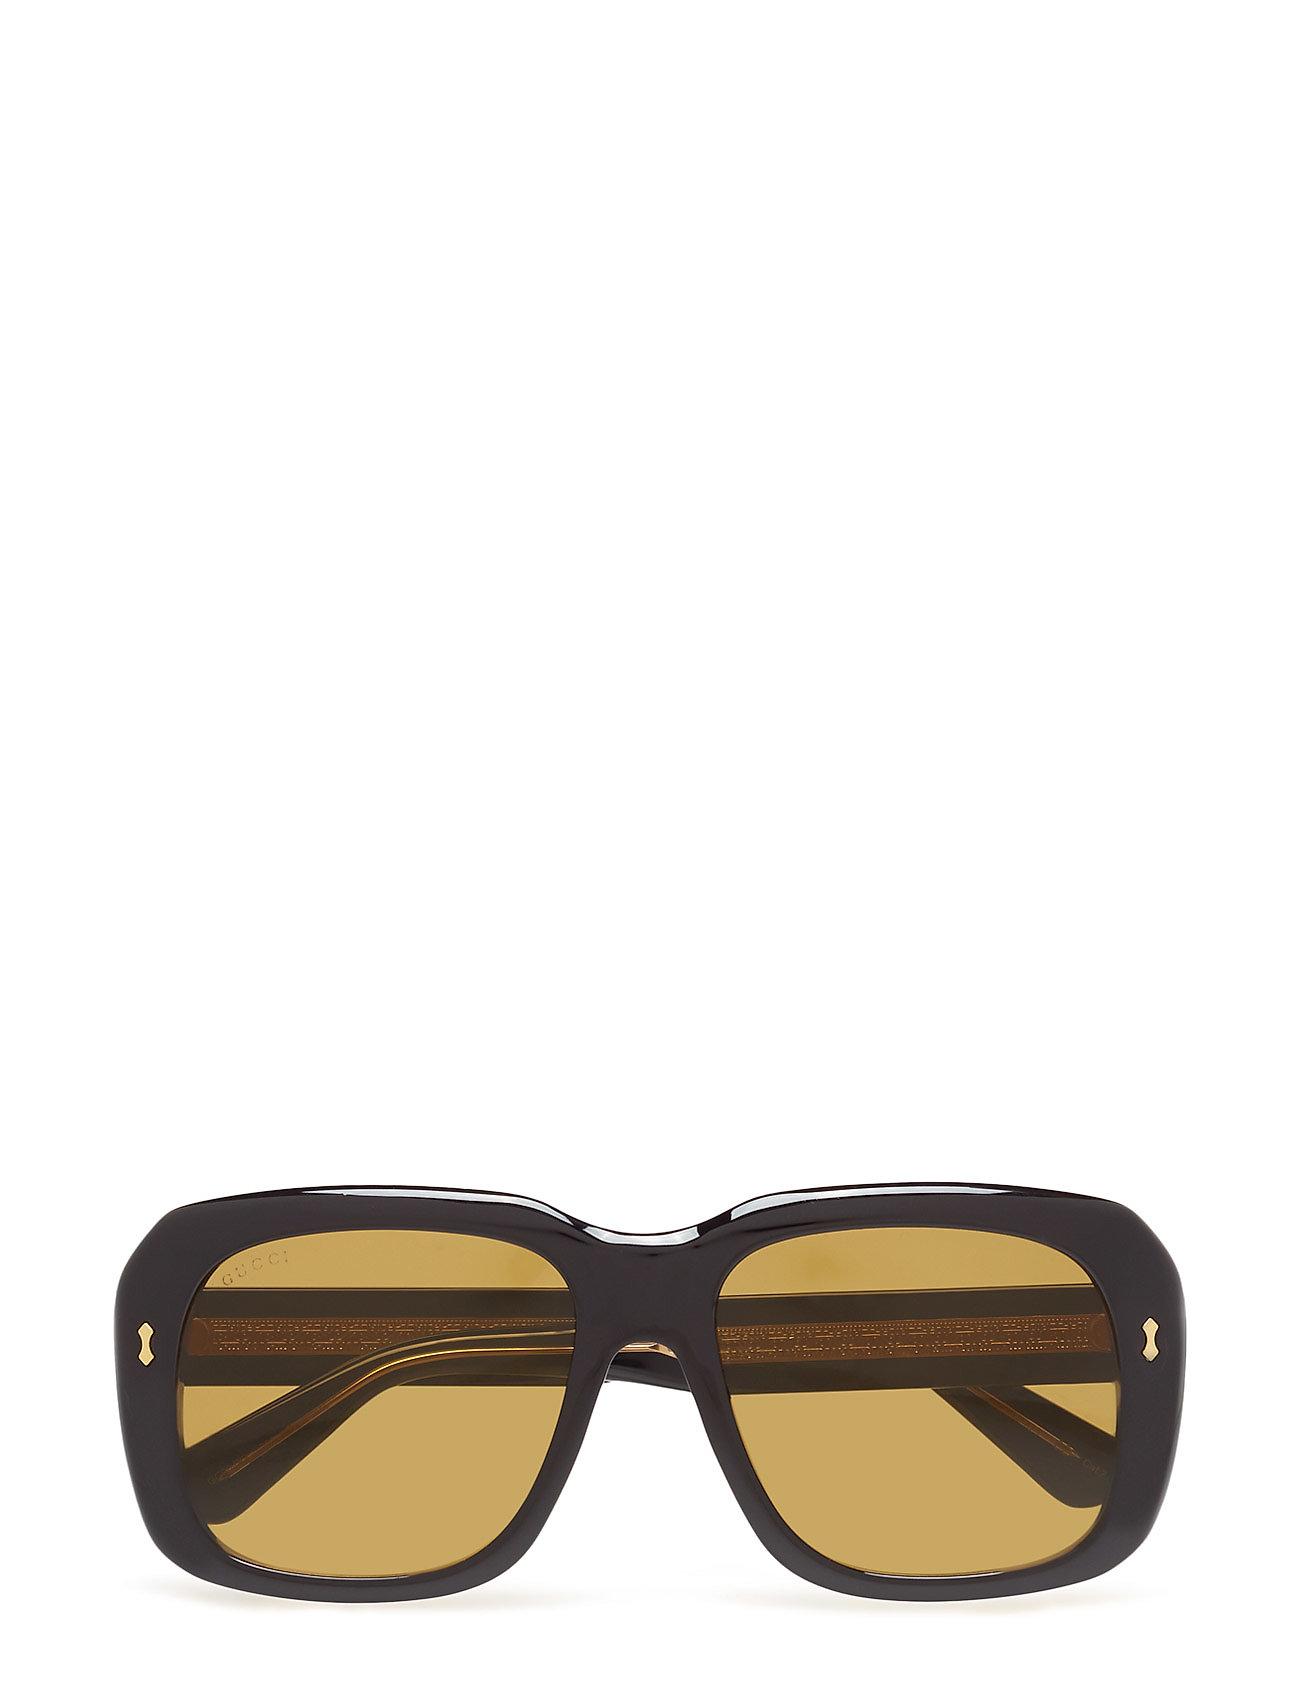 Gg0049s Gucci Sunglasses Accessories til Unisex i